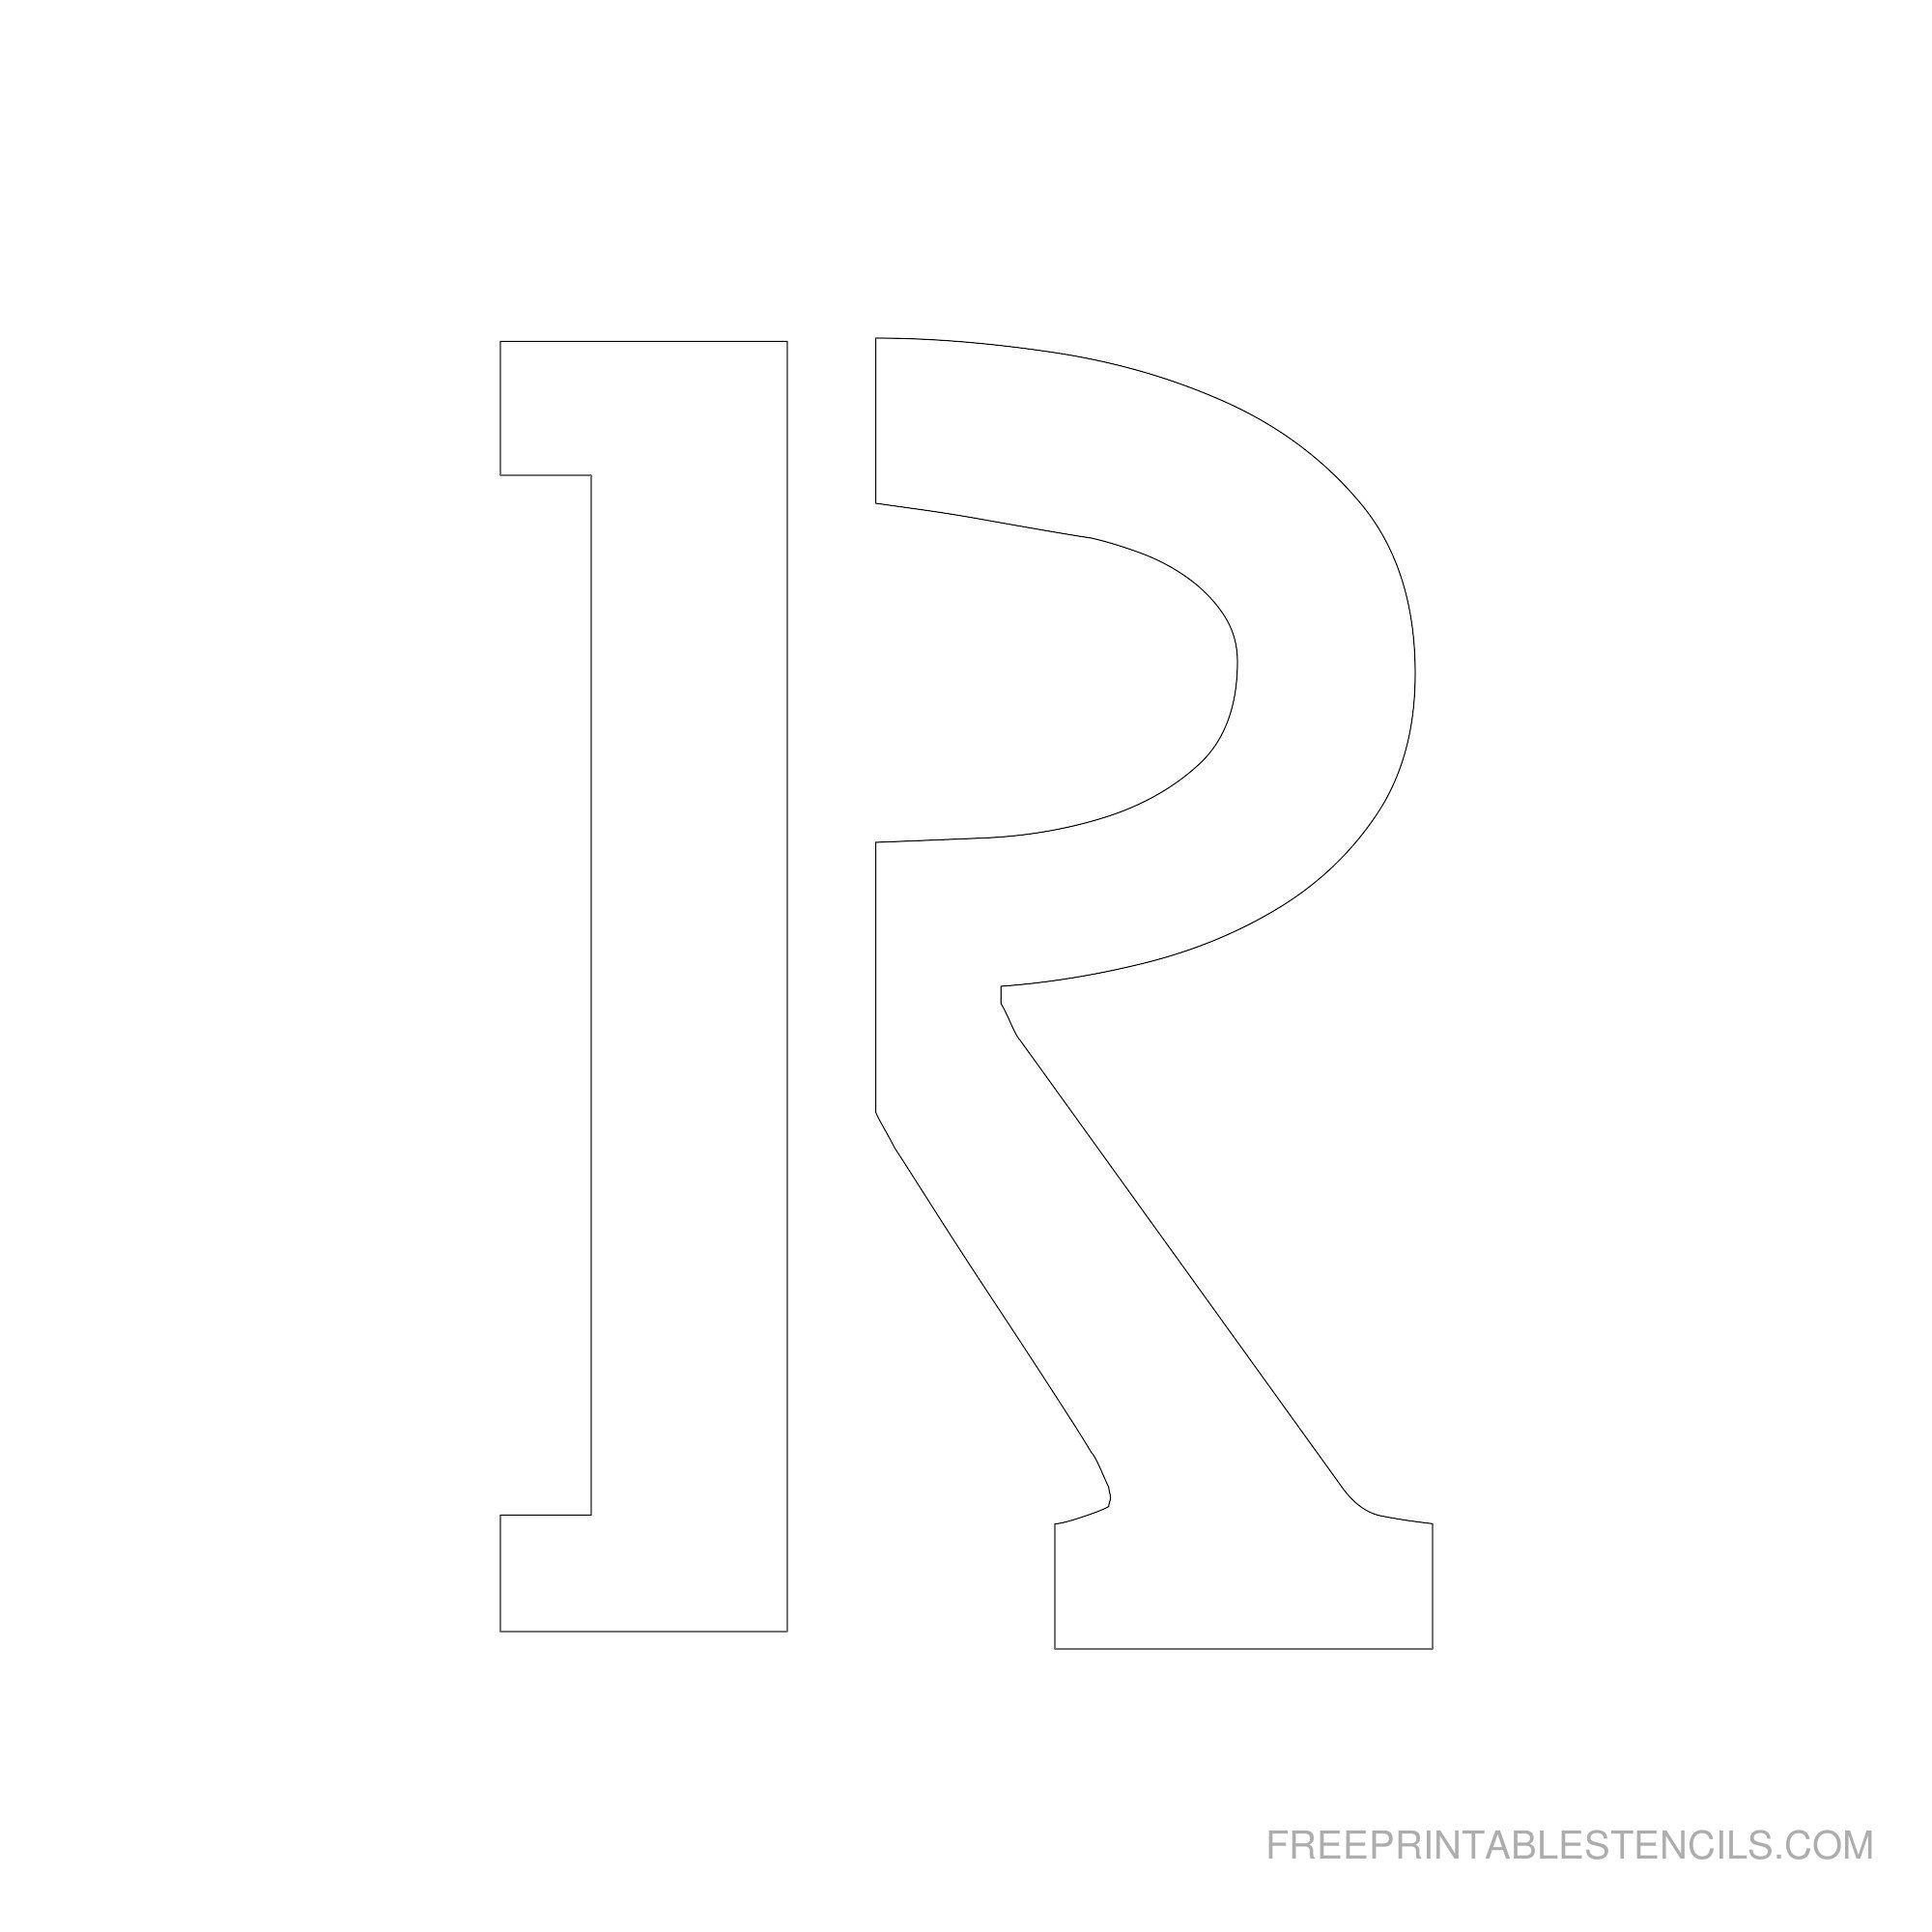 Free printable letter stencils free printable 6 inch alphabet free printable letter stencils free printable 6 inch alphabet letter stencils print these free spiritdancerdesigns Choice Image